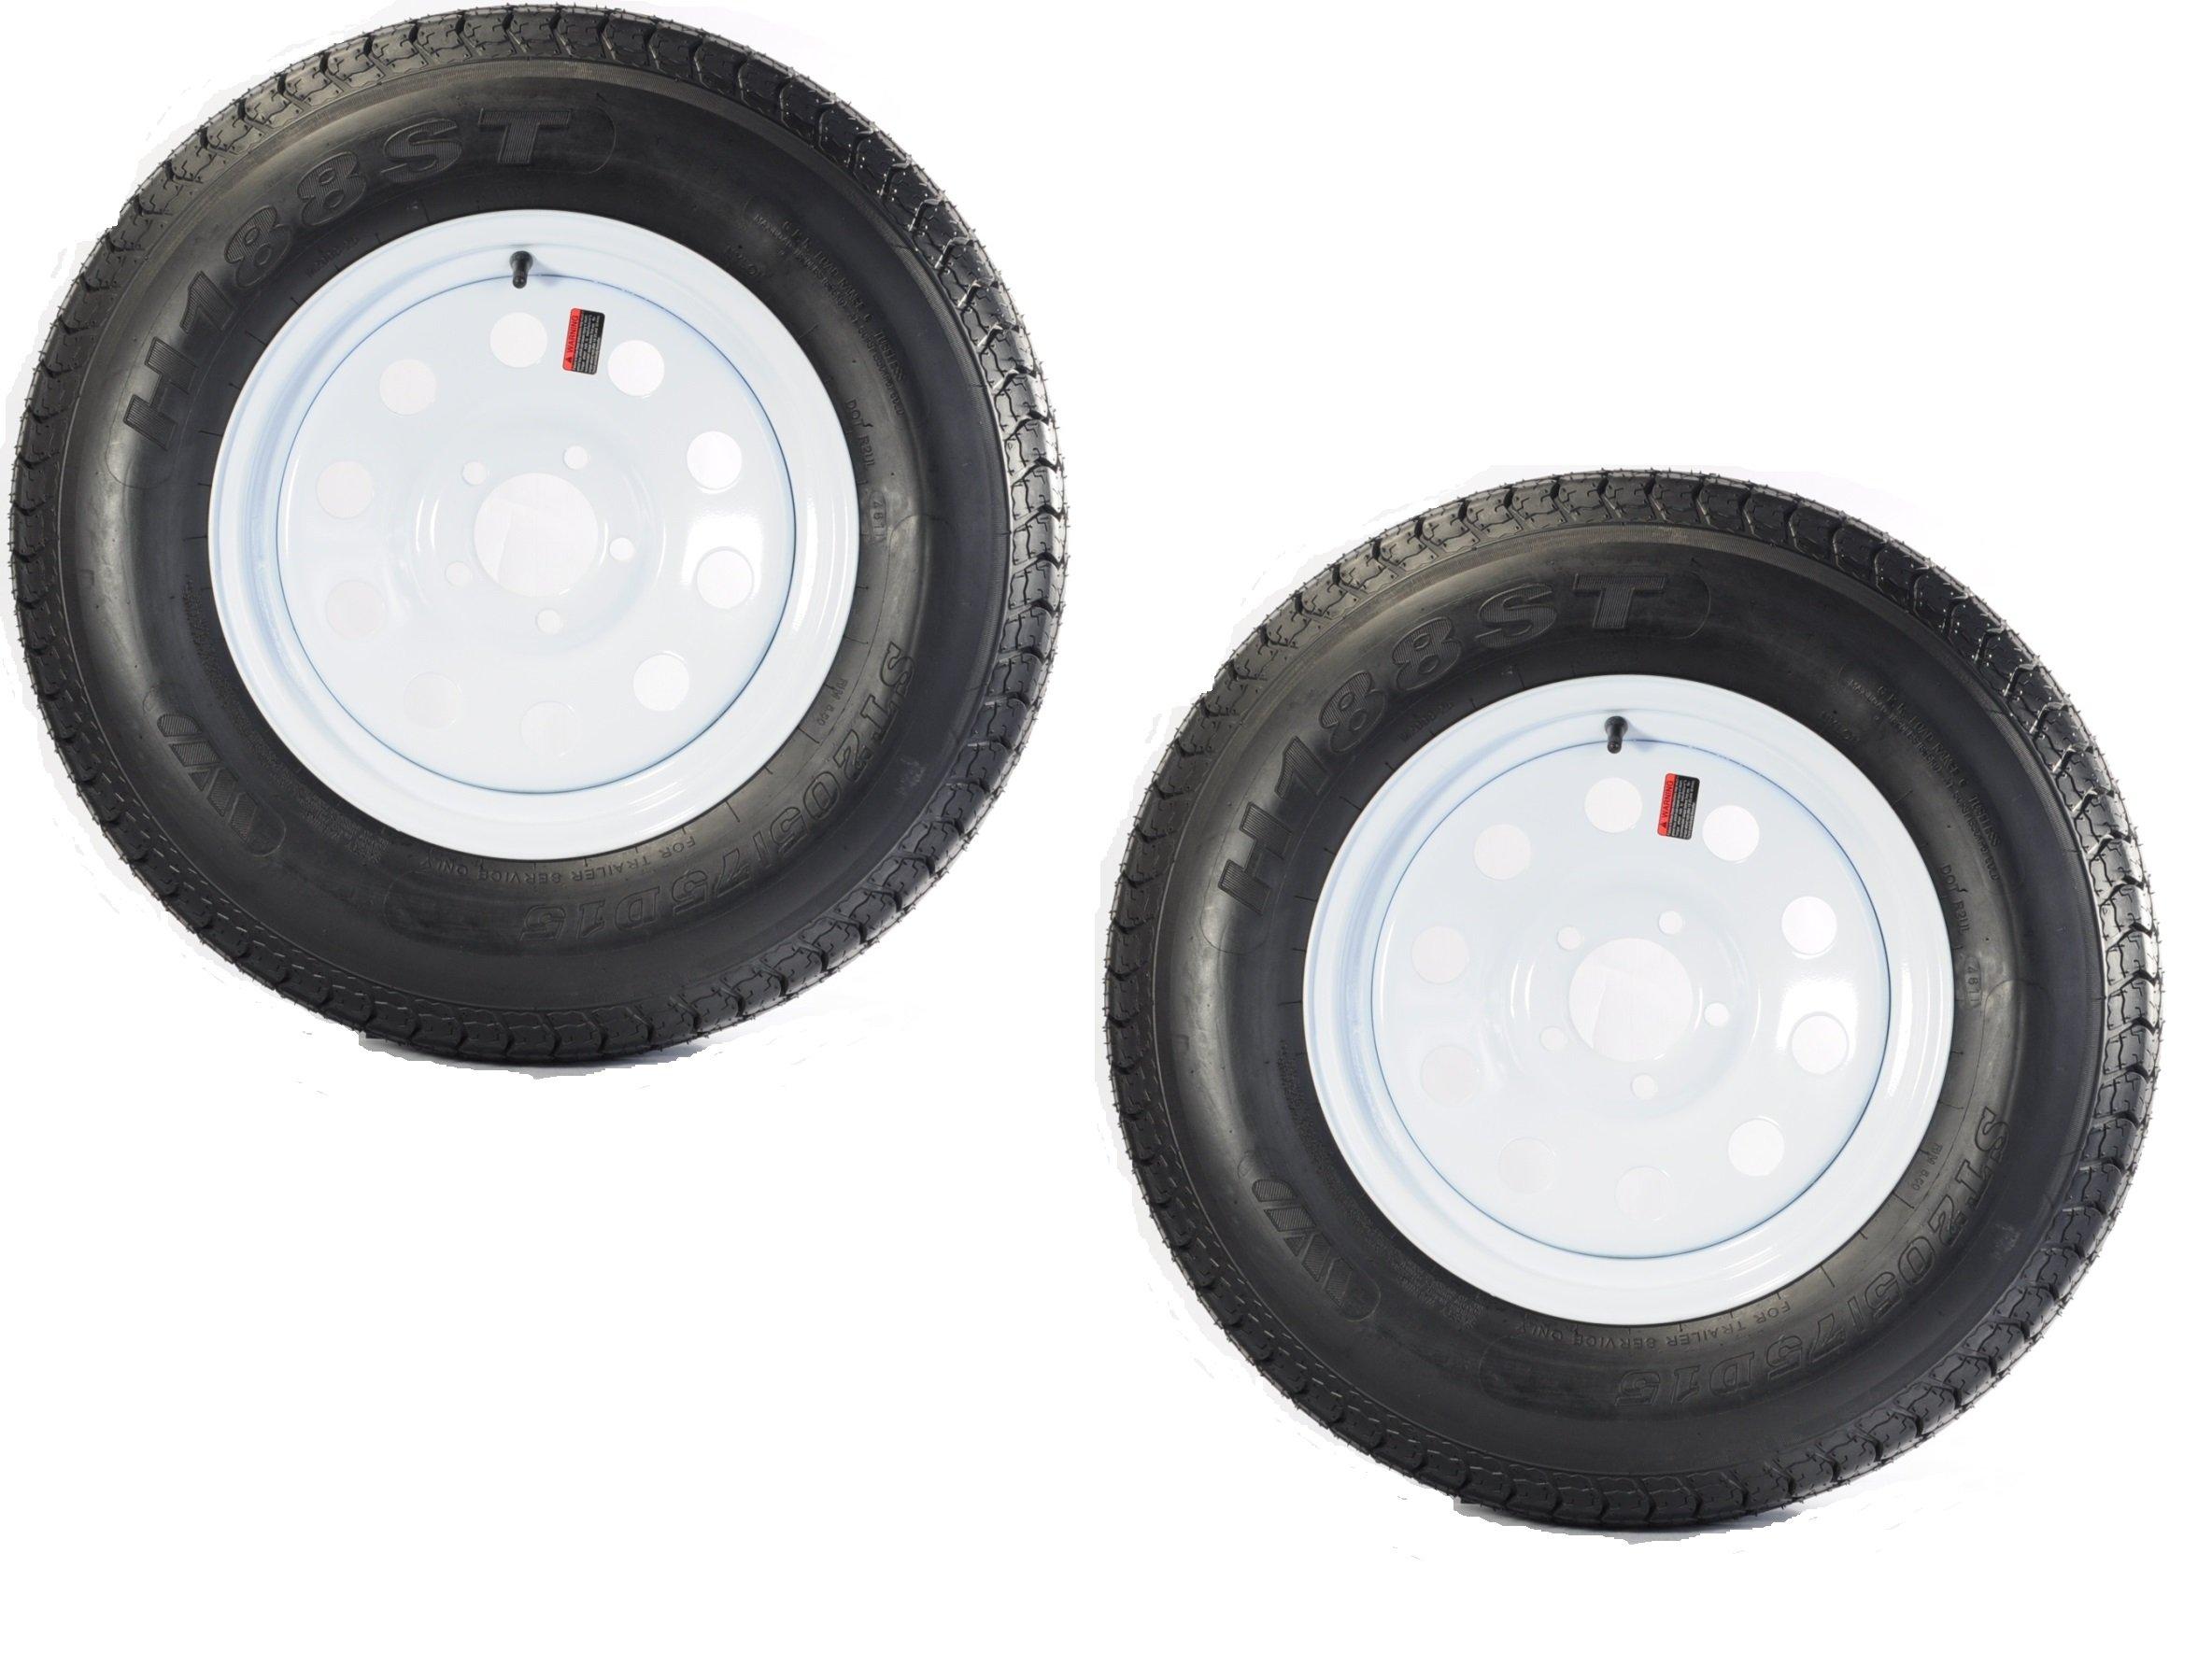 2-Pk eCustomrim Trailer Tire & Rim ST205/75D15 15'' Load D 5 Lug White Mod 58533